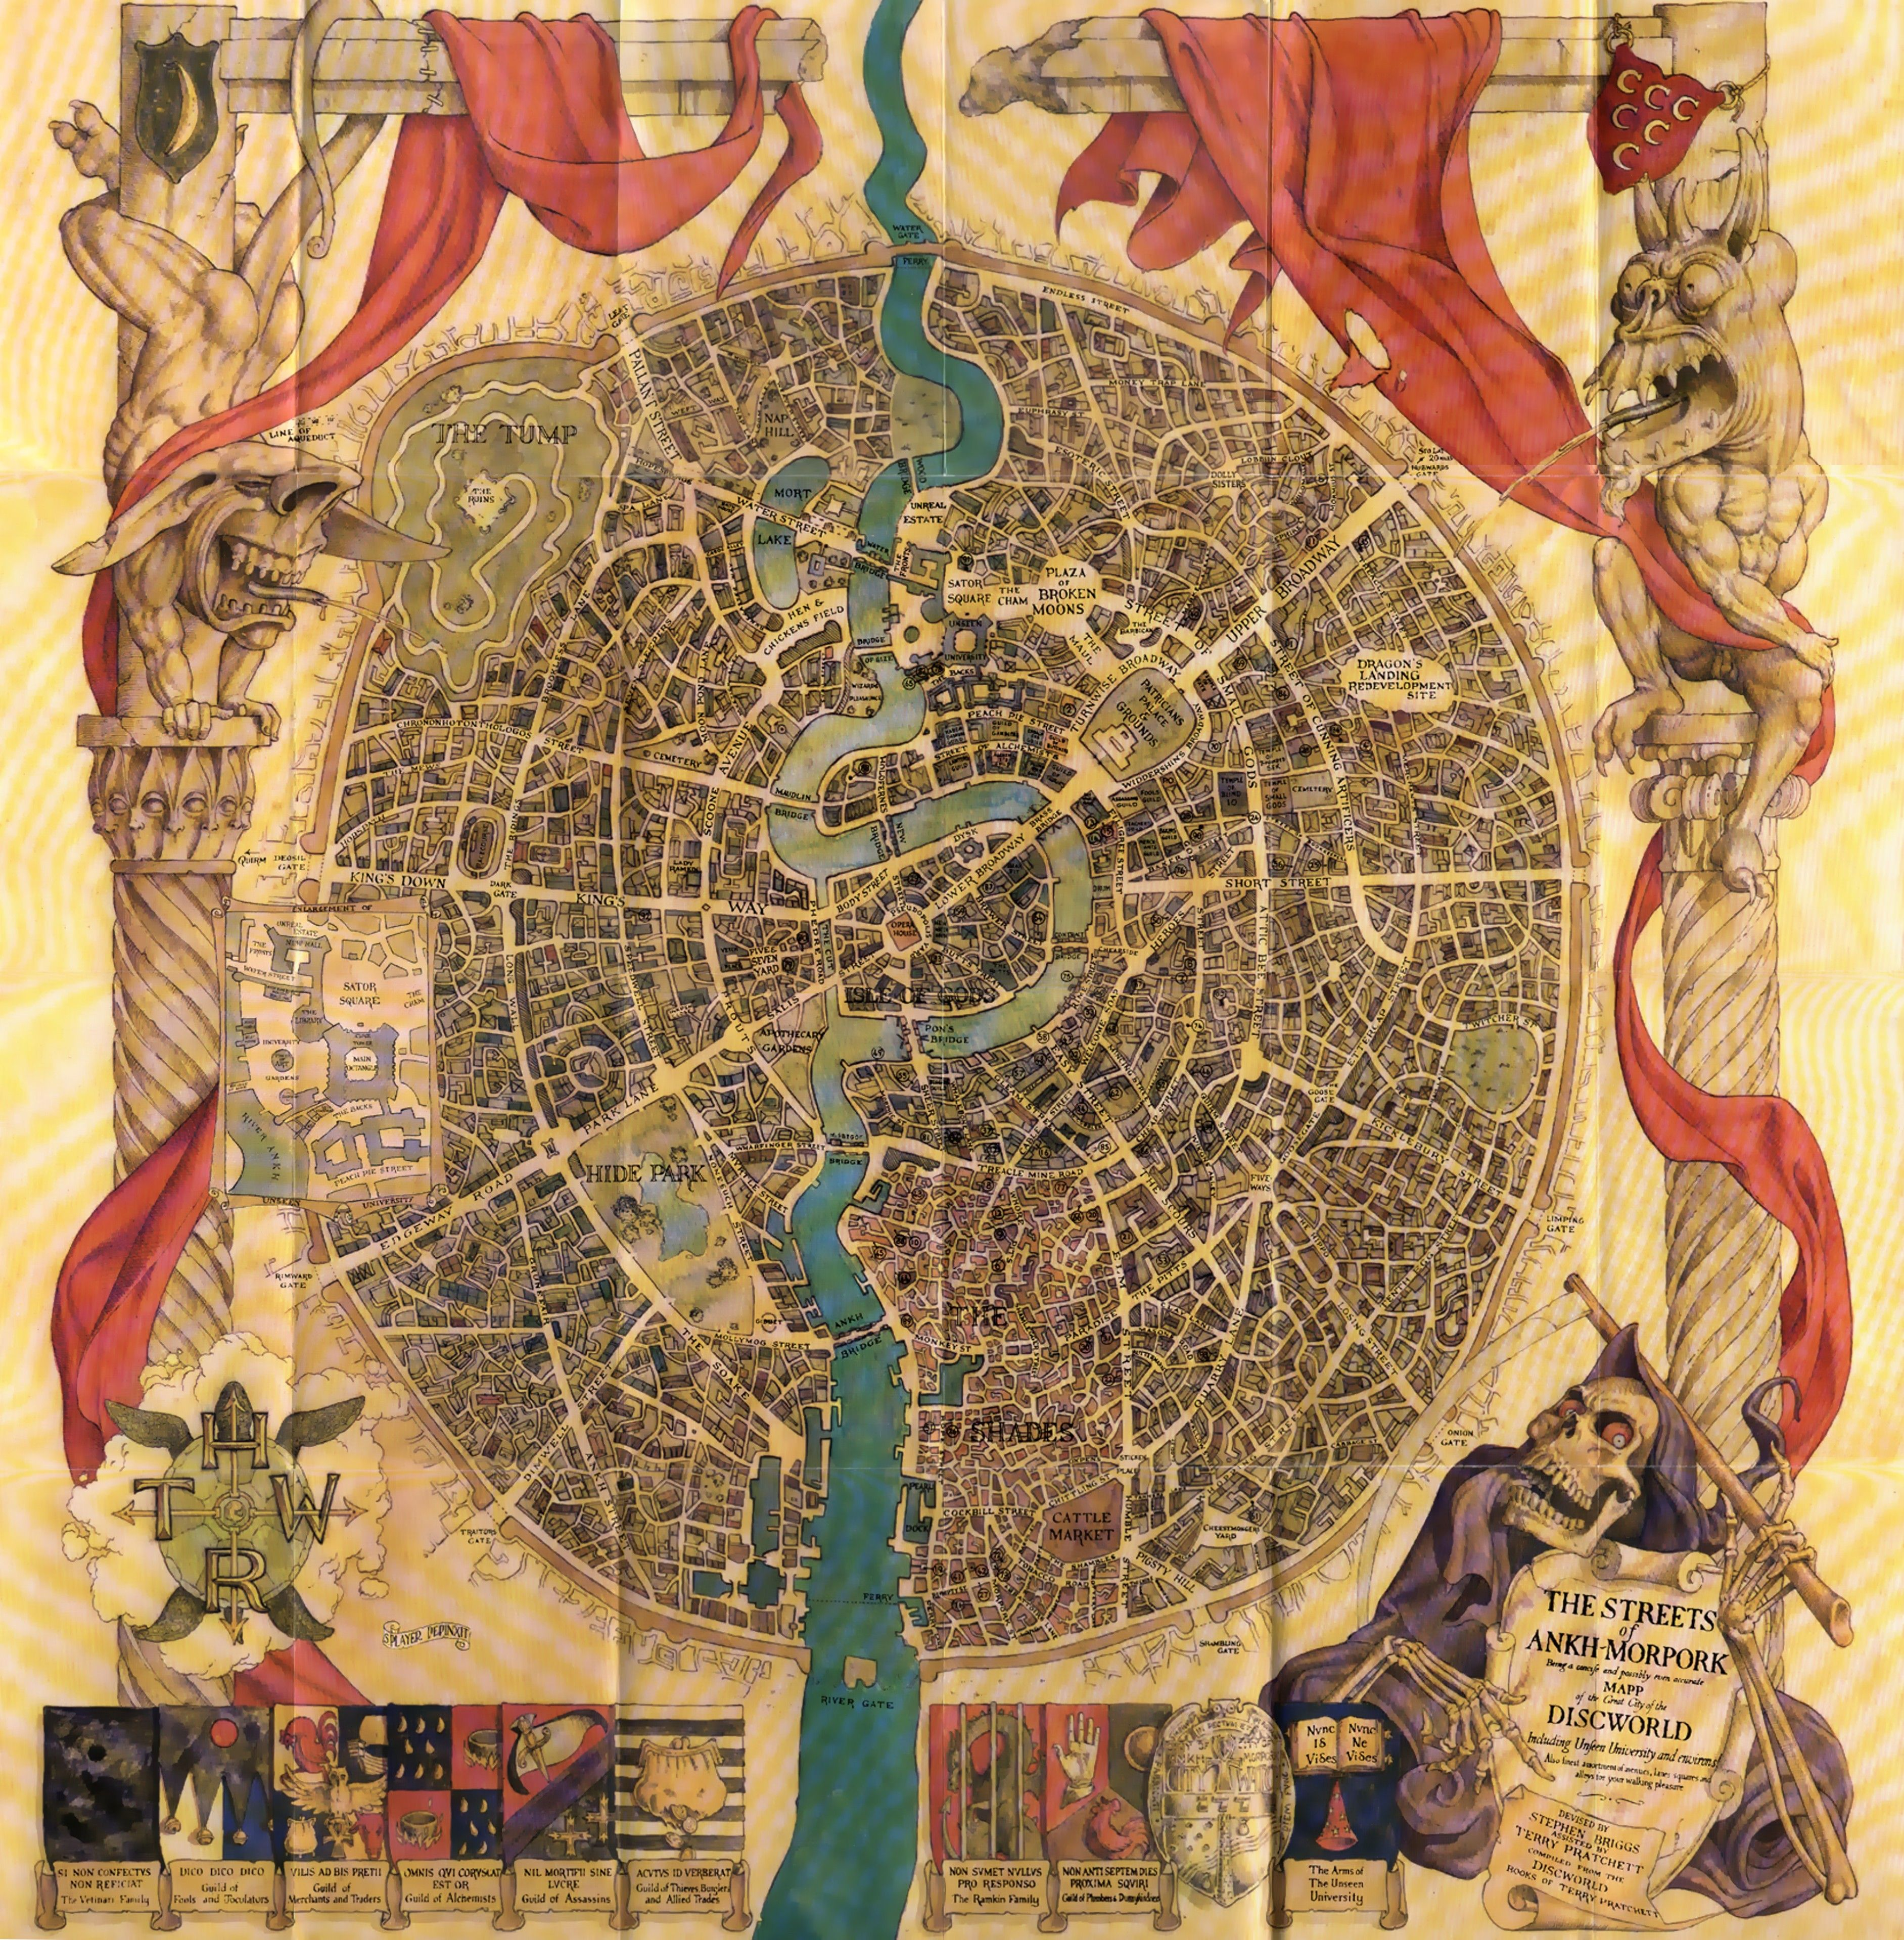 Map Of Ankh Morpork Discworld Map Terry Pratchett Discworld